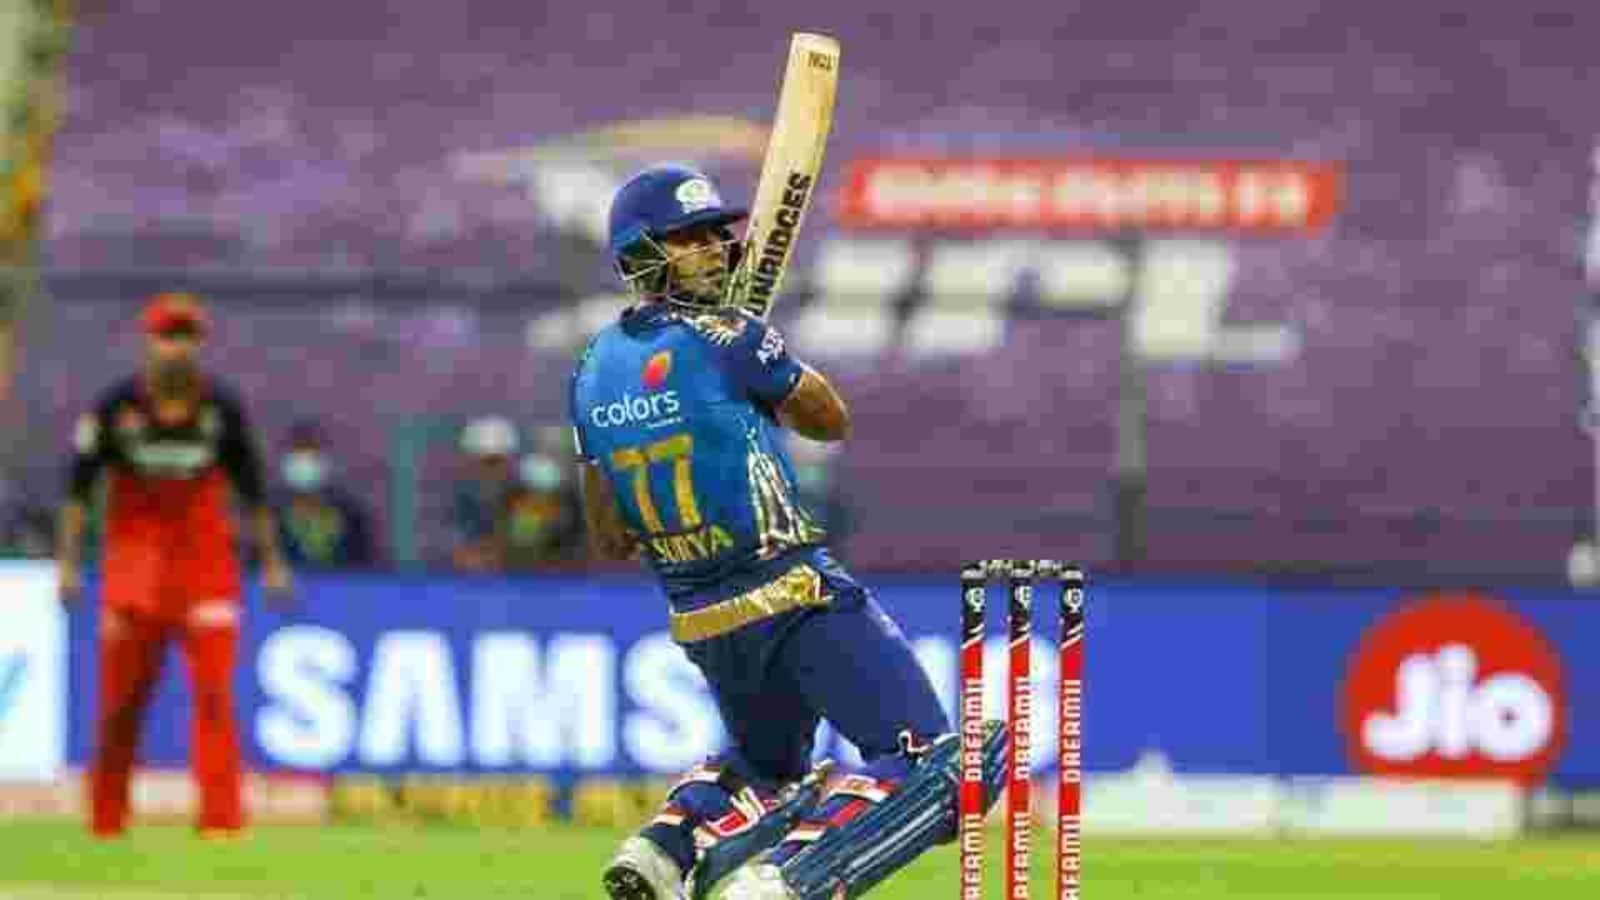 Suryakumar Yadav cherishes maiden India call-up with quickfire fifty in Vijay Hazare Trophy - Hindustan Times